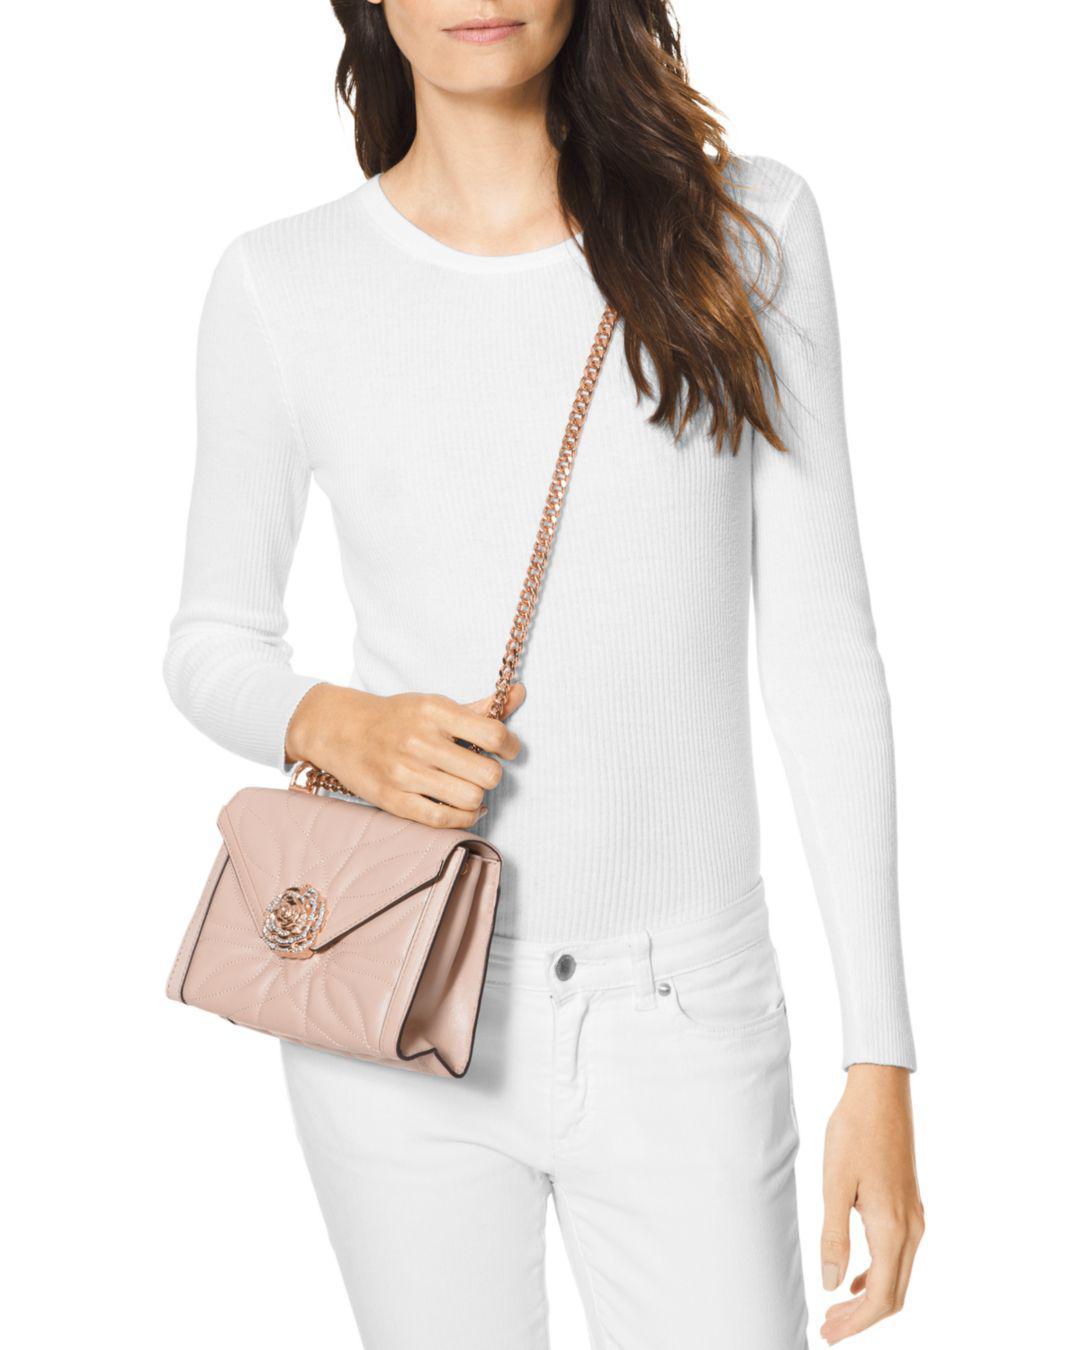 8ac2706de0e4 Lyst - MICHAEL Michael Kors Whitney Leather Convertible Shoulder Bag in Pink